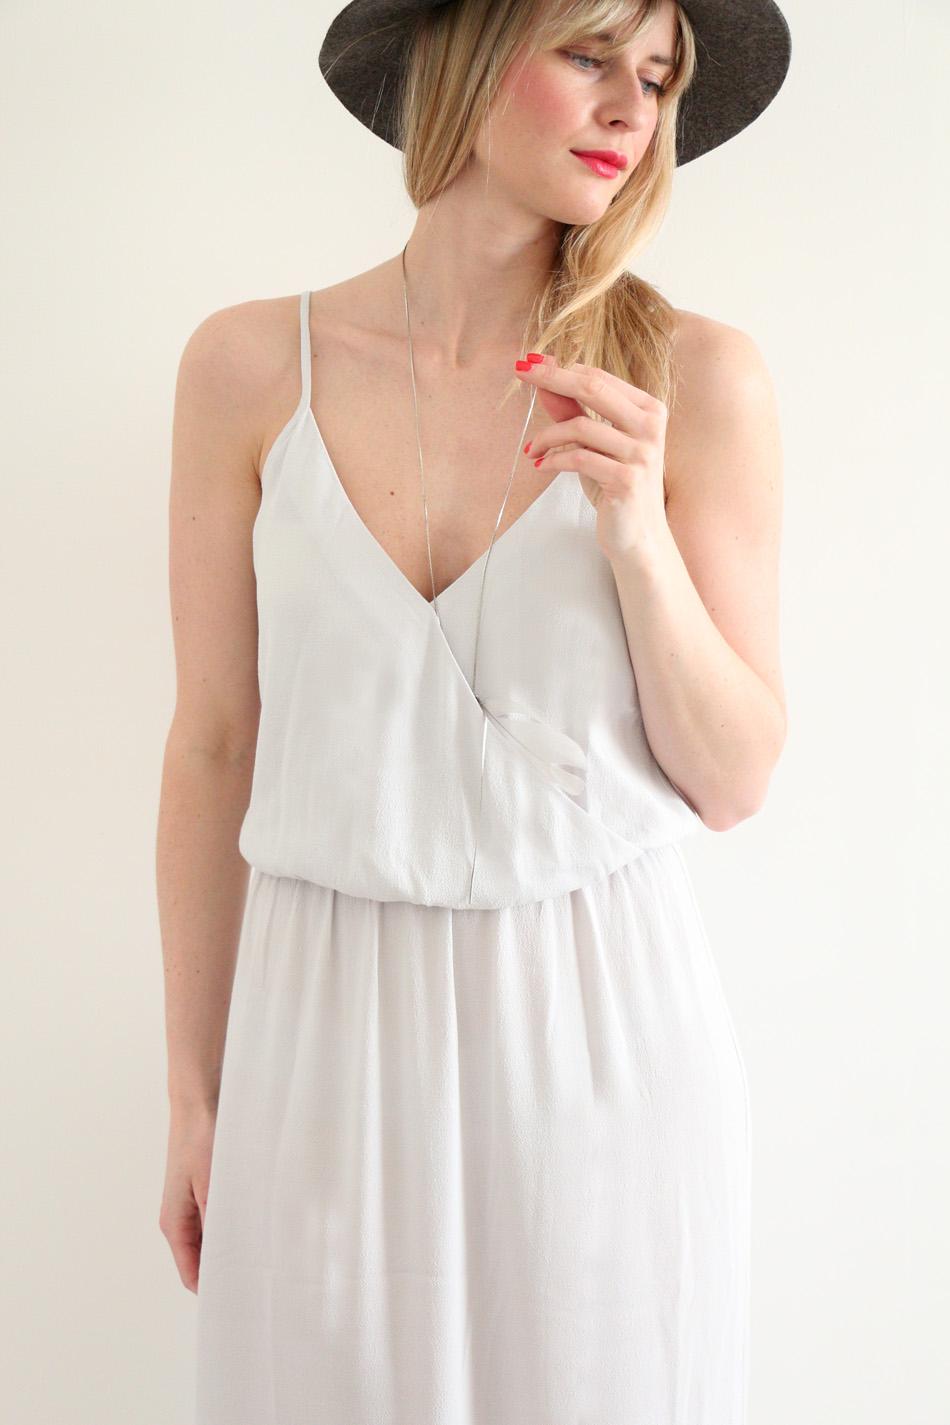 FD American Vintage dress IMG_1105 950px